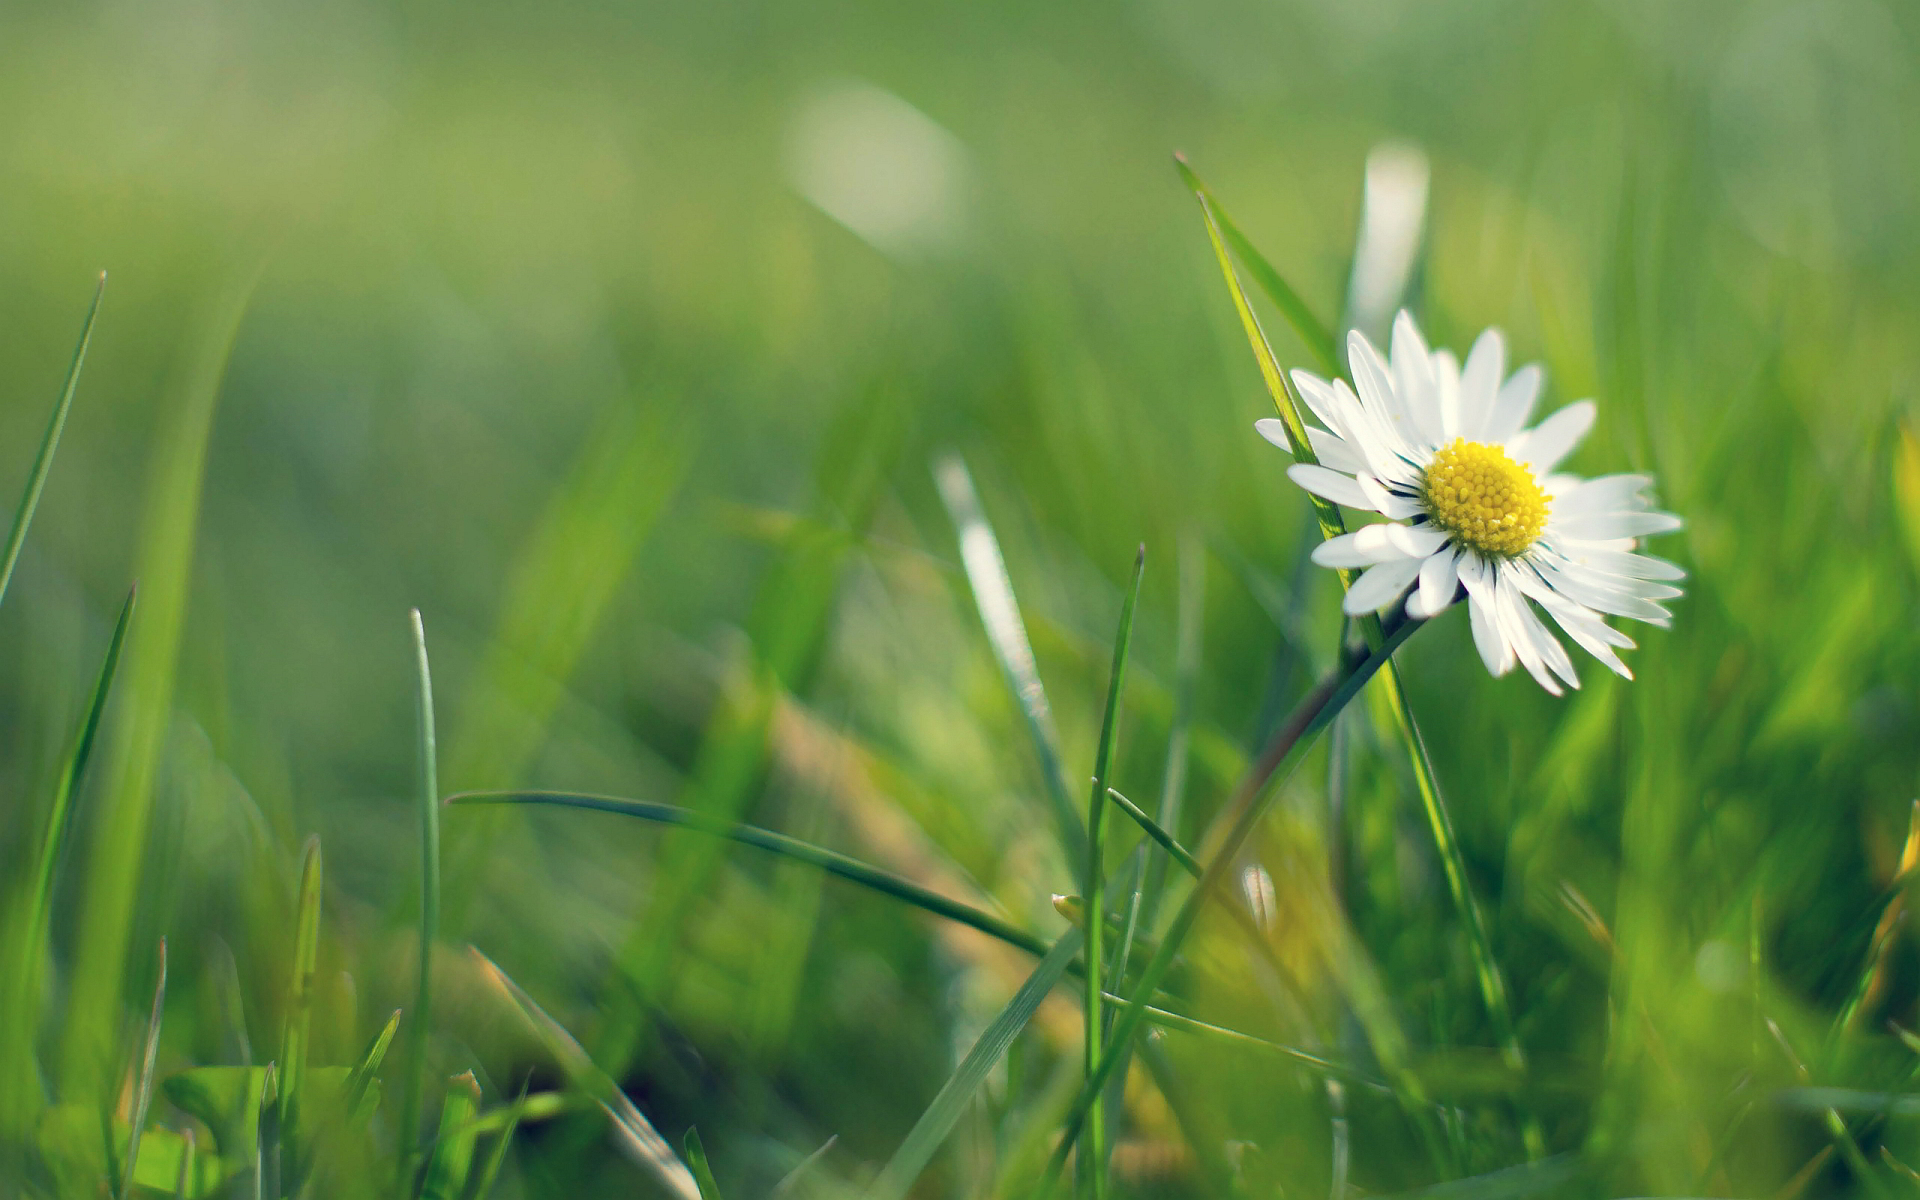 white daisy meadow wallpaper